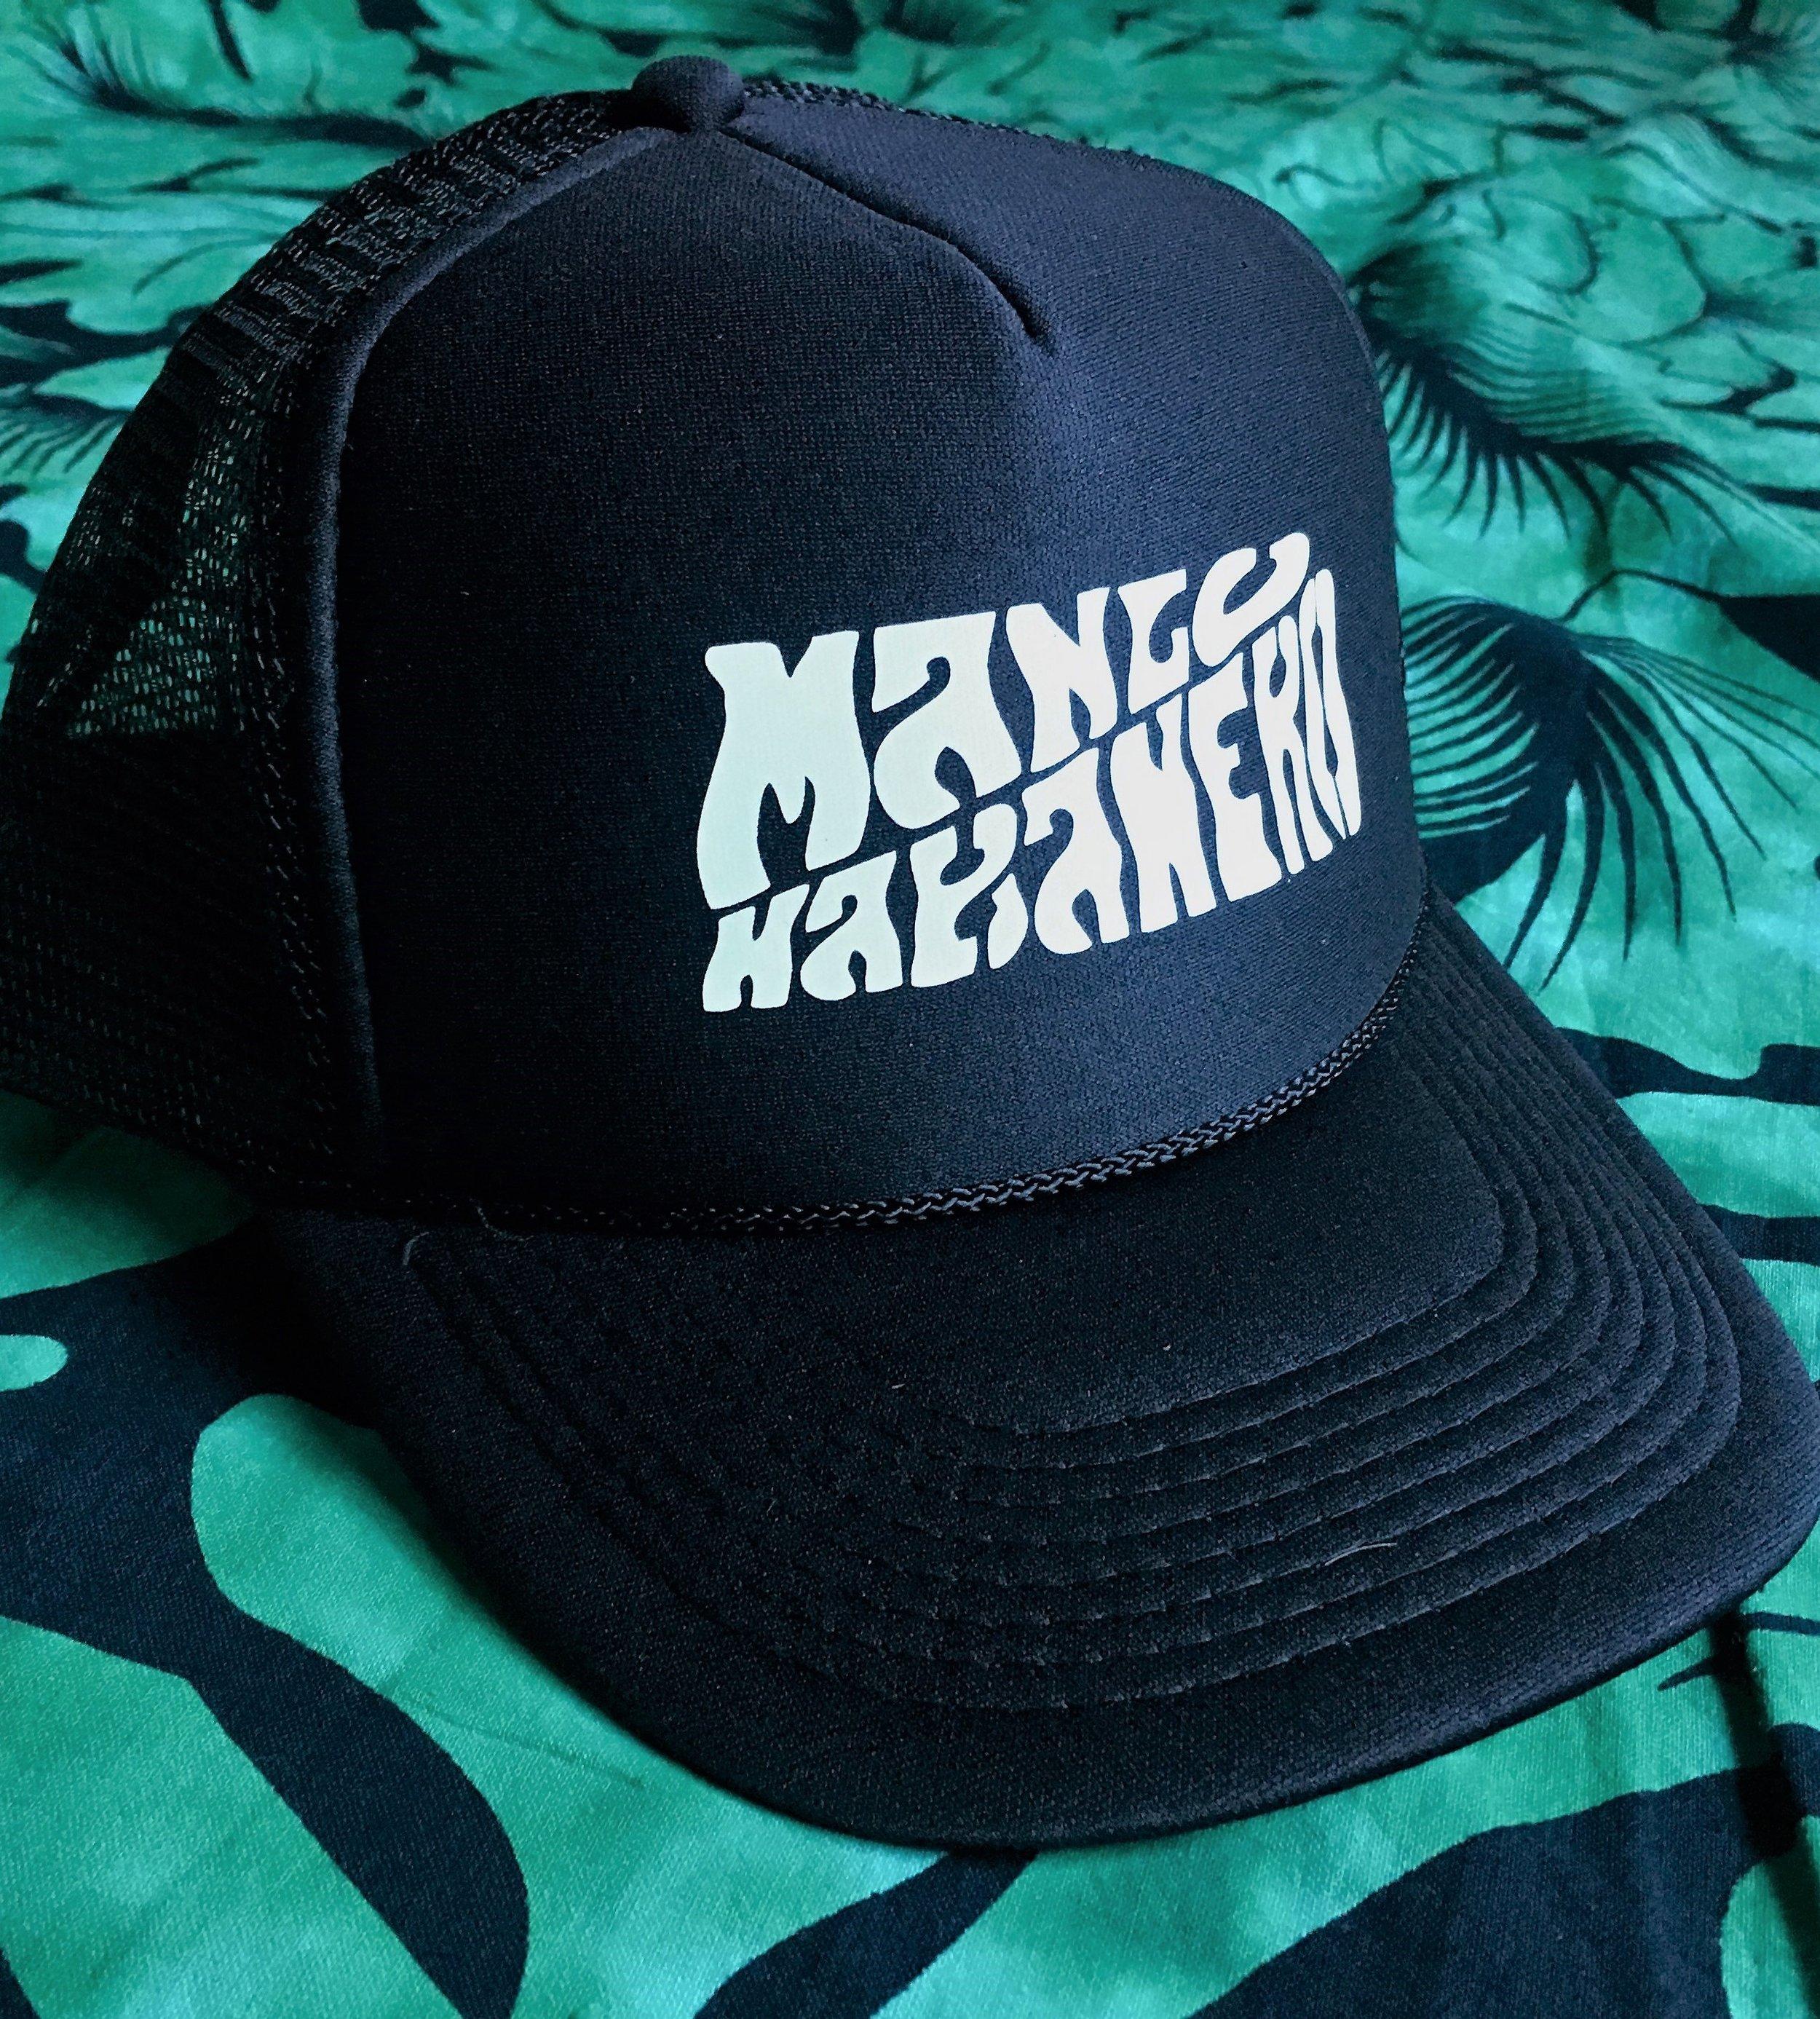 Trucker Hat $15 - - Unisex, adjustable- Black with White logo